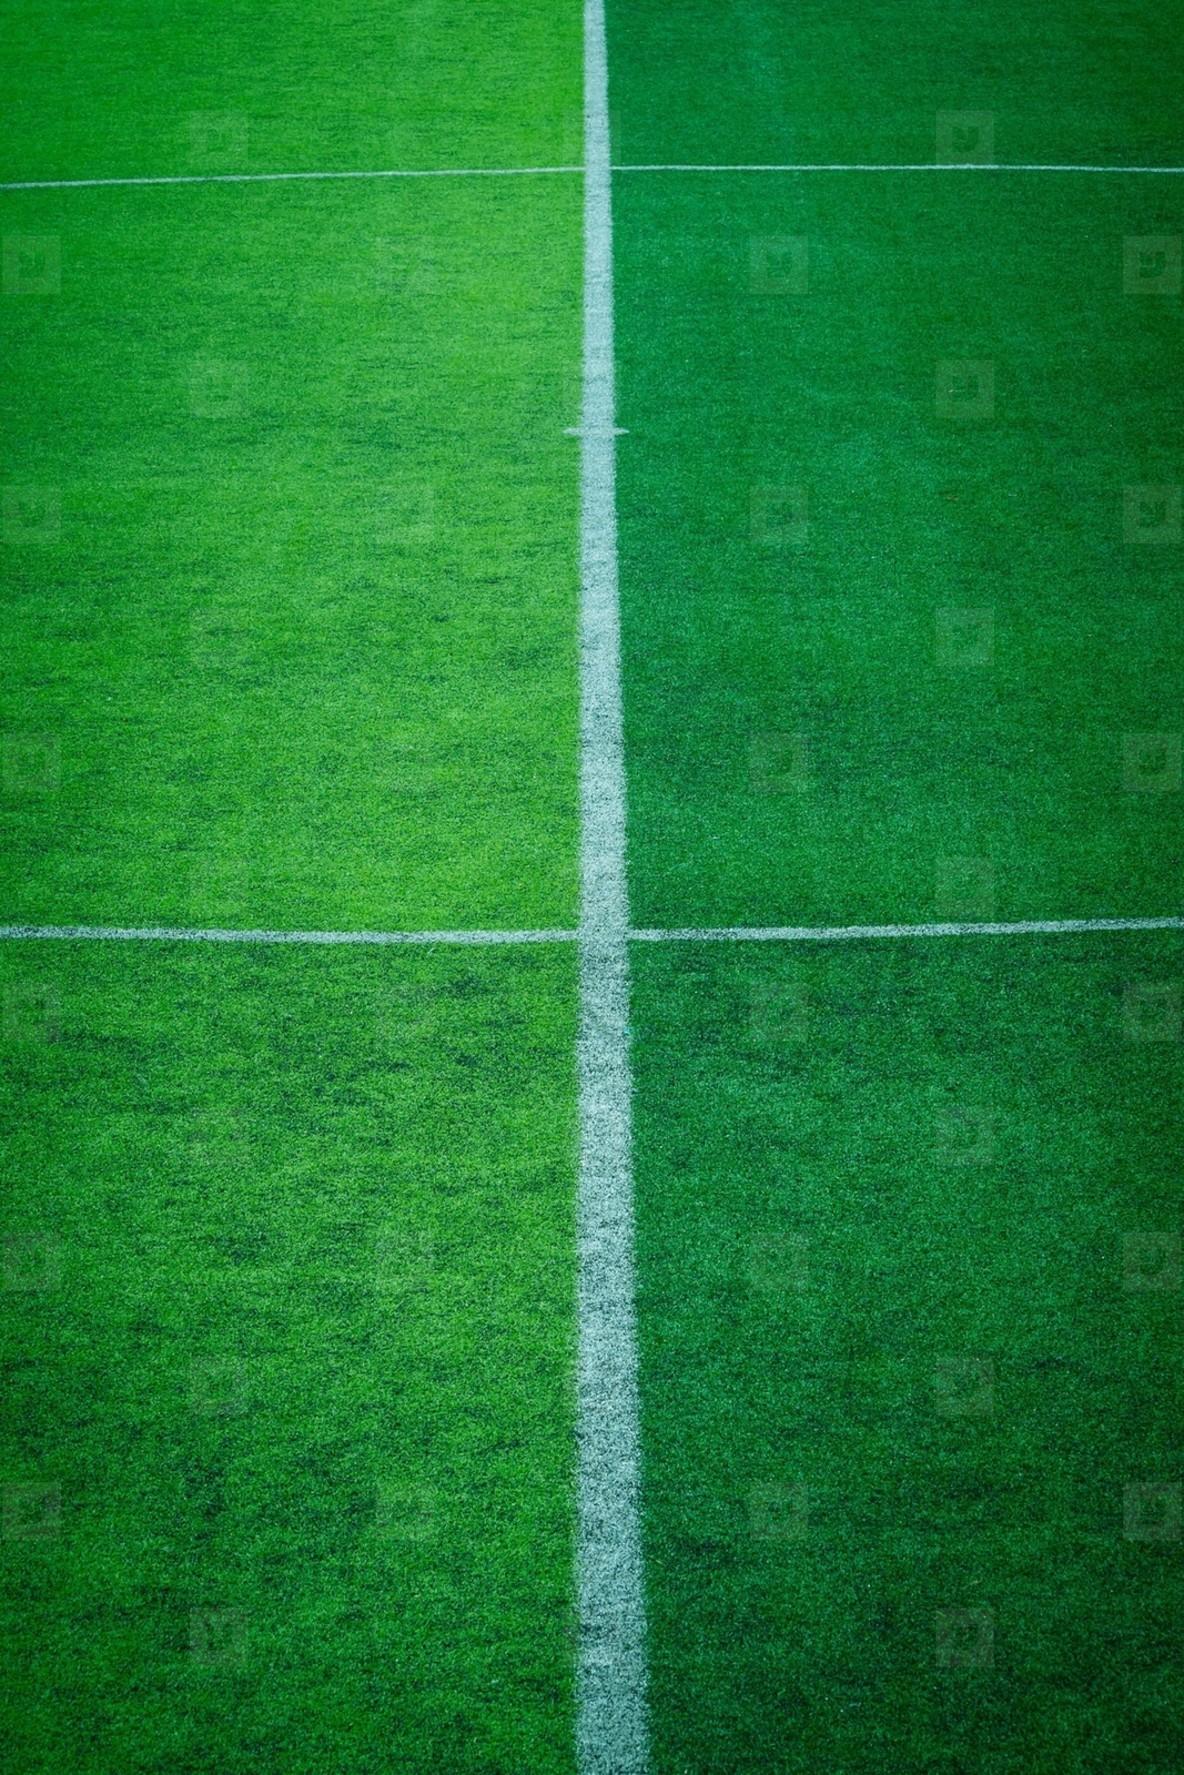 artificial turf of Soccer footba